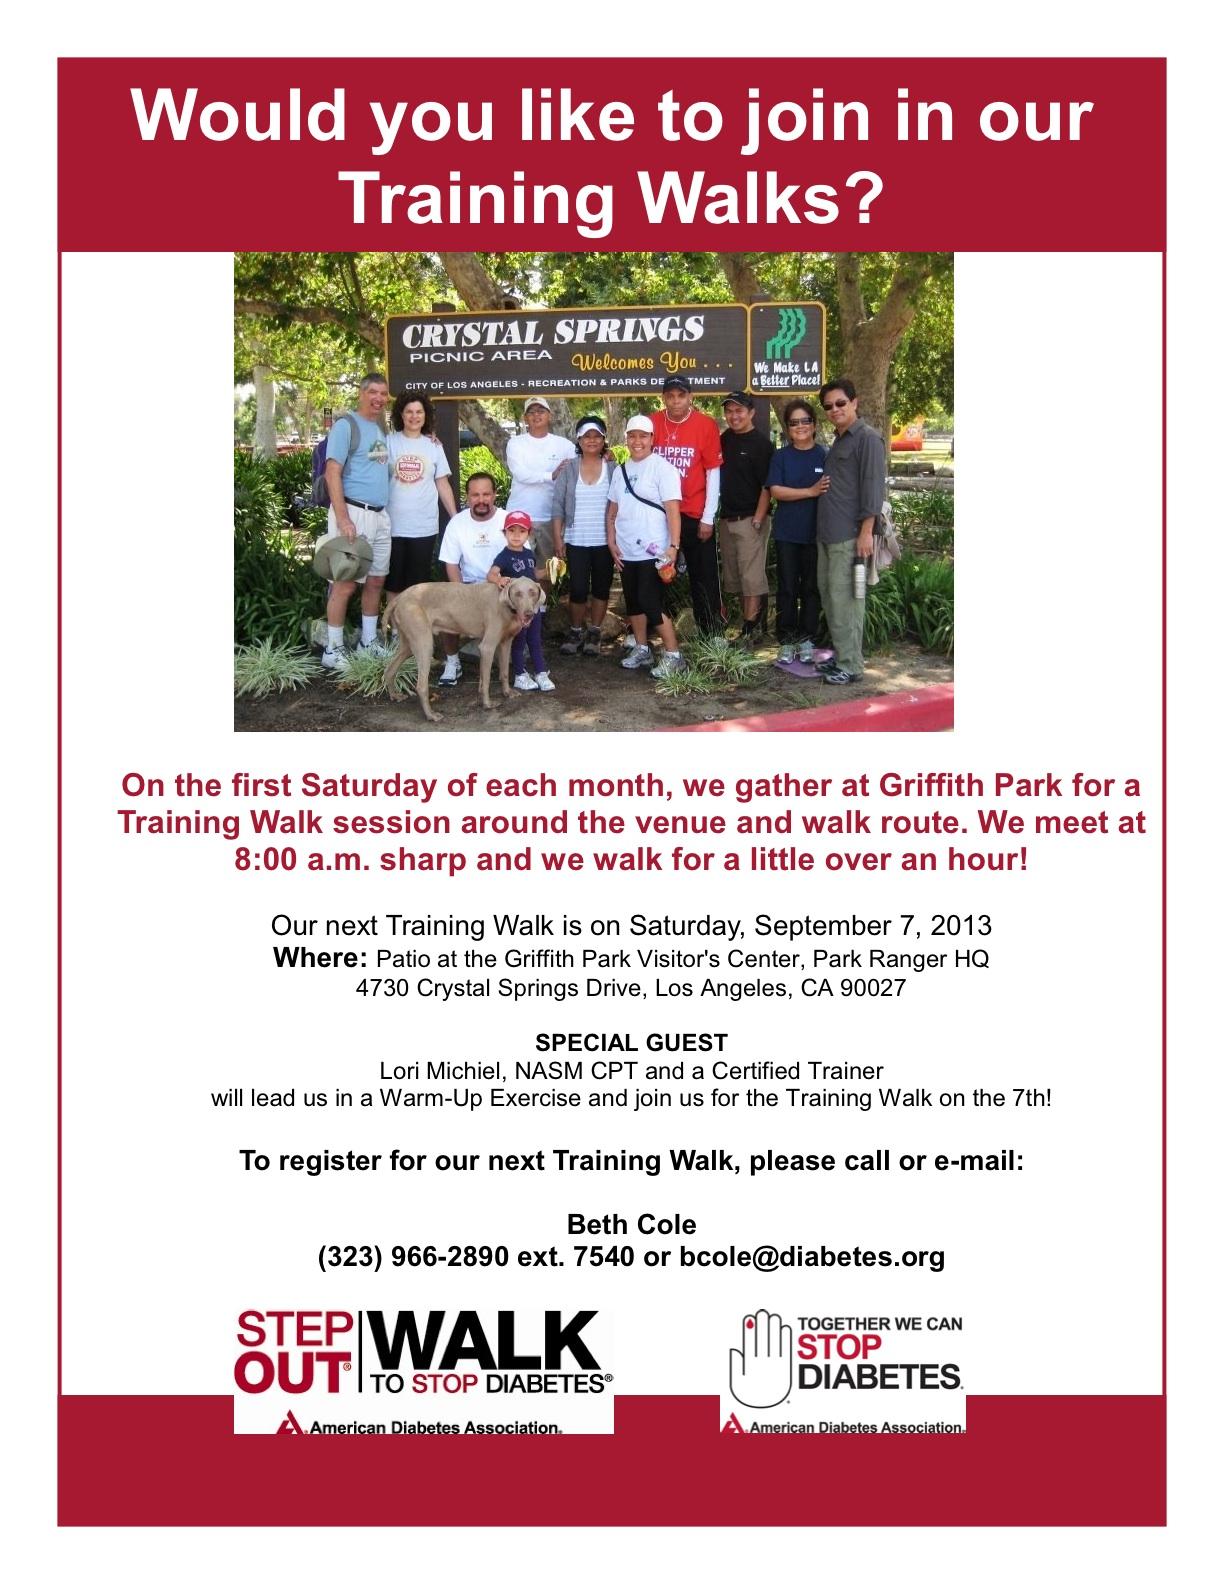 Lori Michiel Invited to Lead Warm-Up for an American Diabetes Association Training Walk